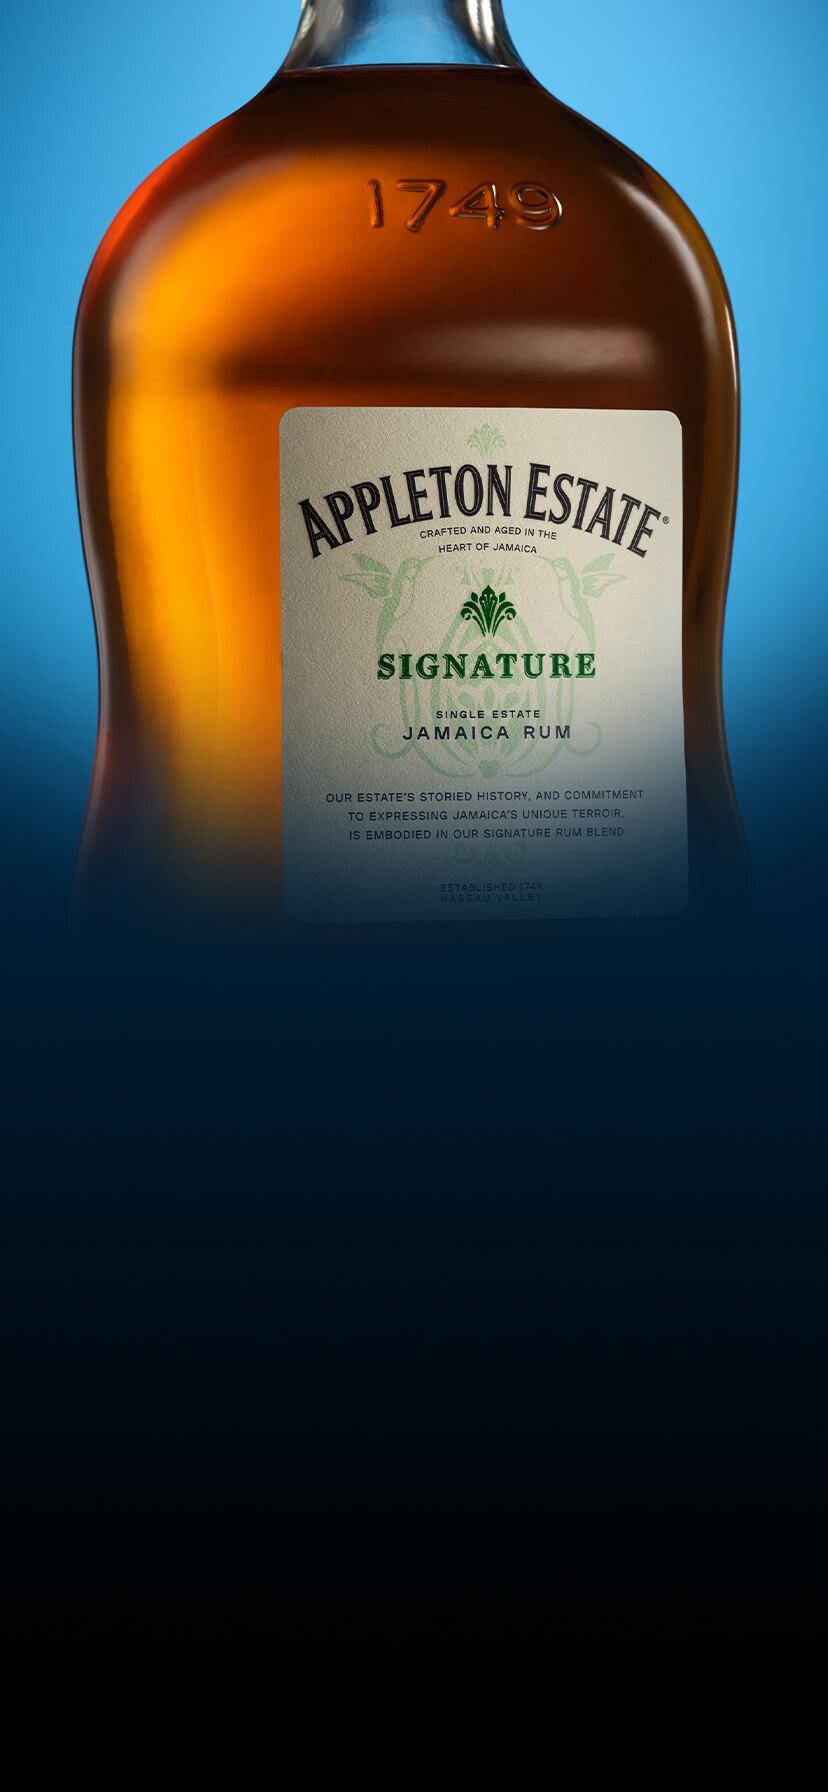 Appleton Estate Signature Blend Appearance